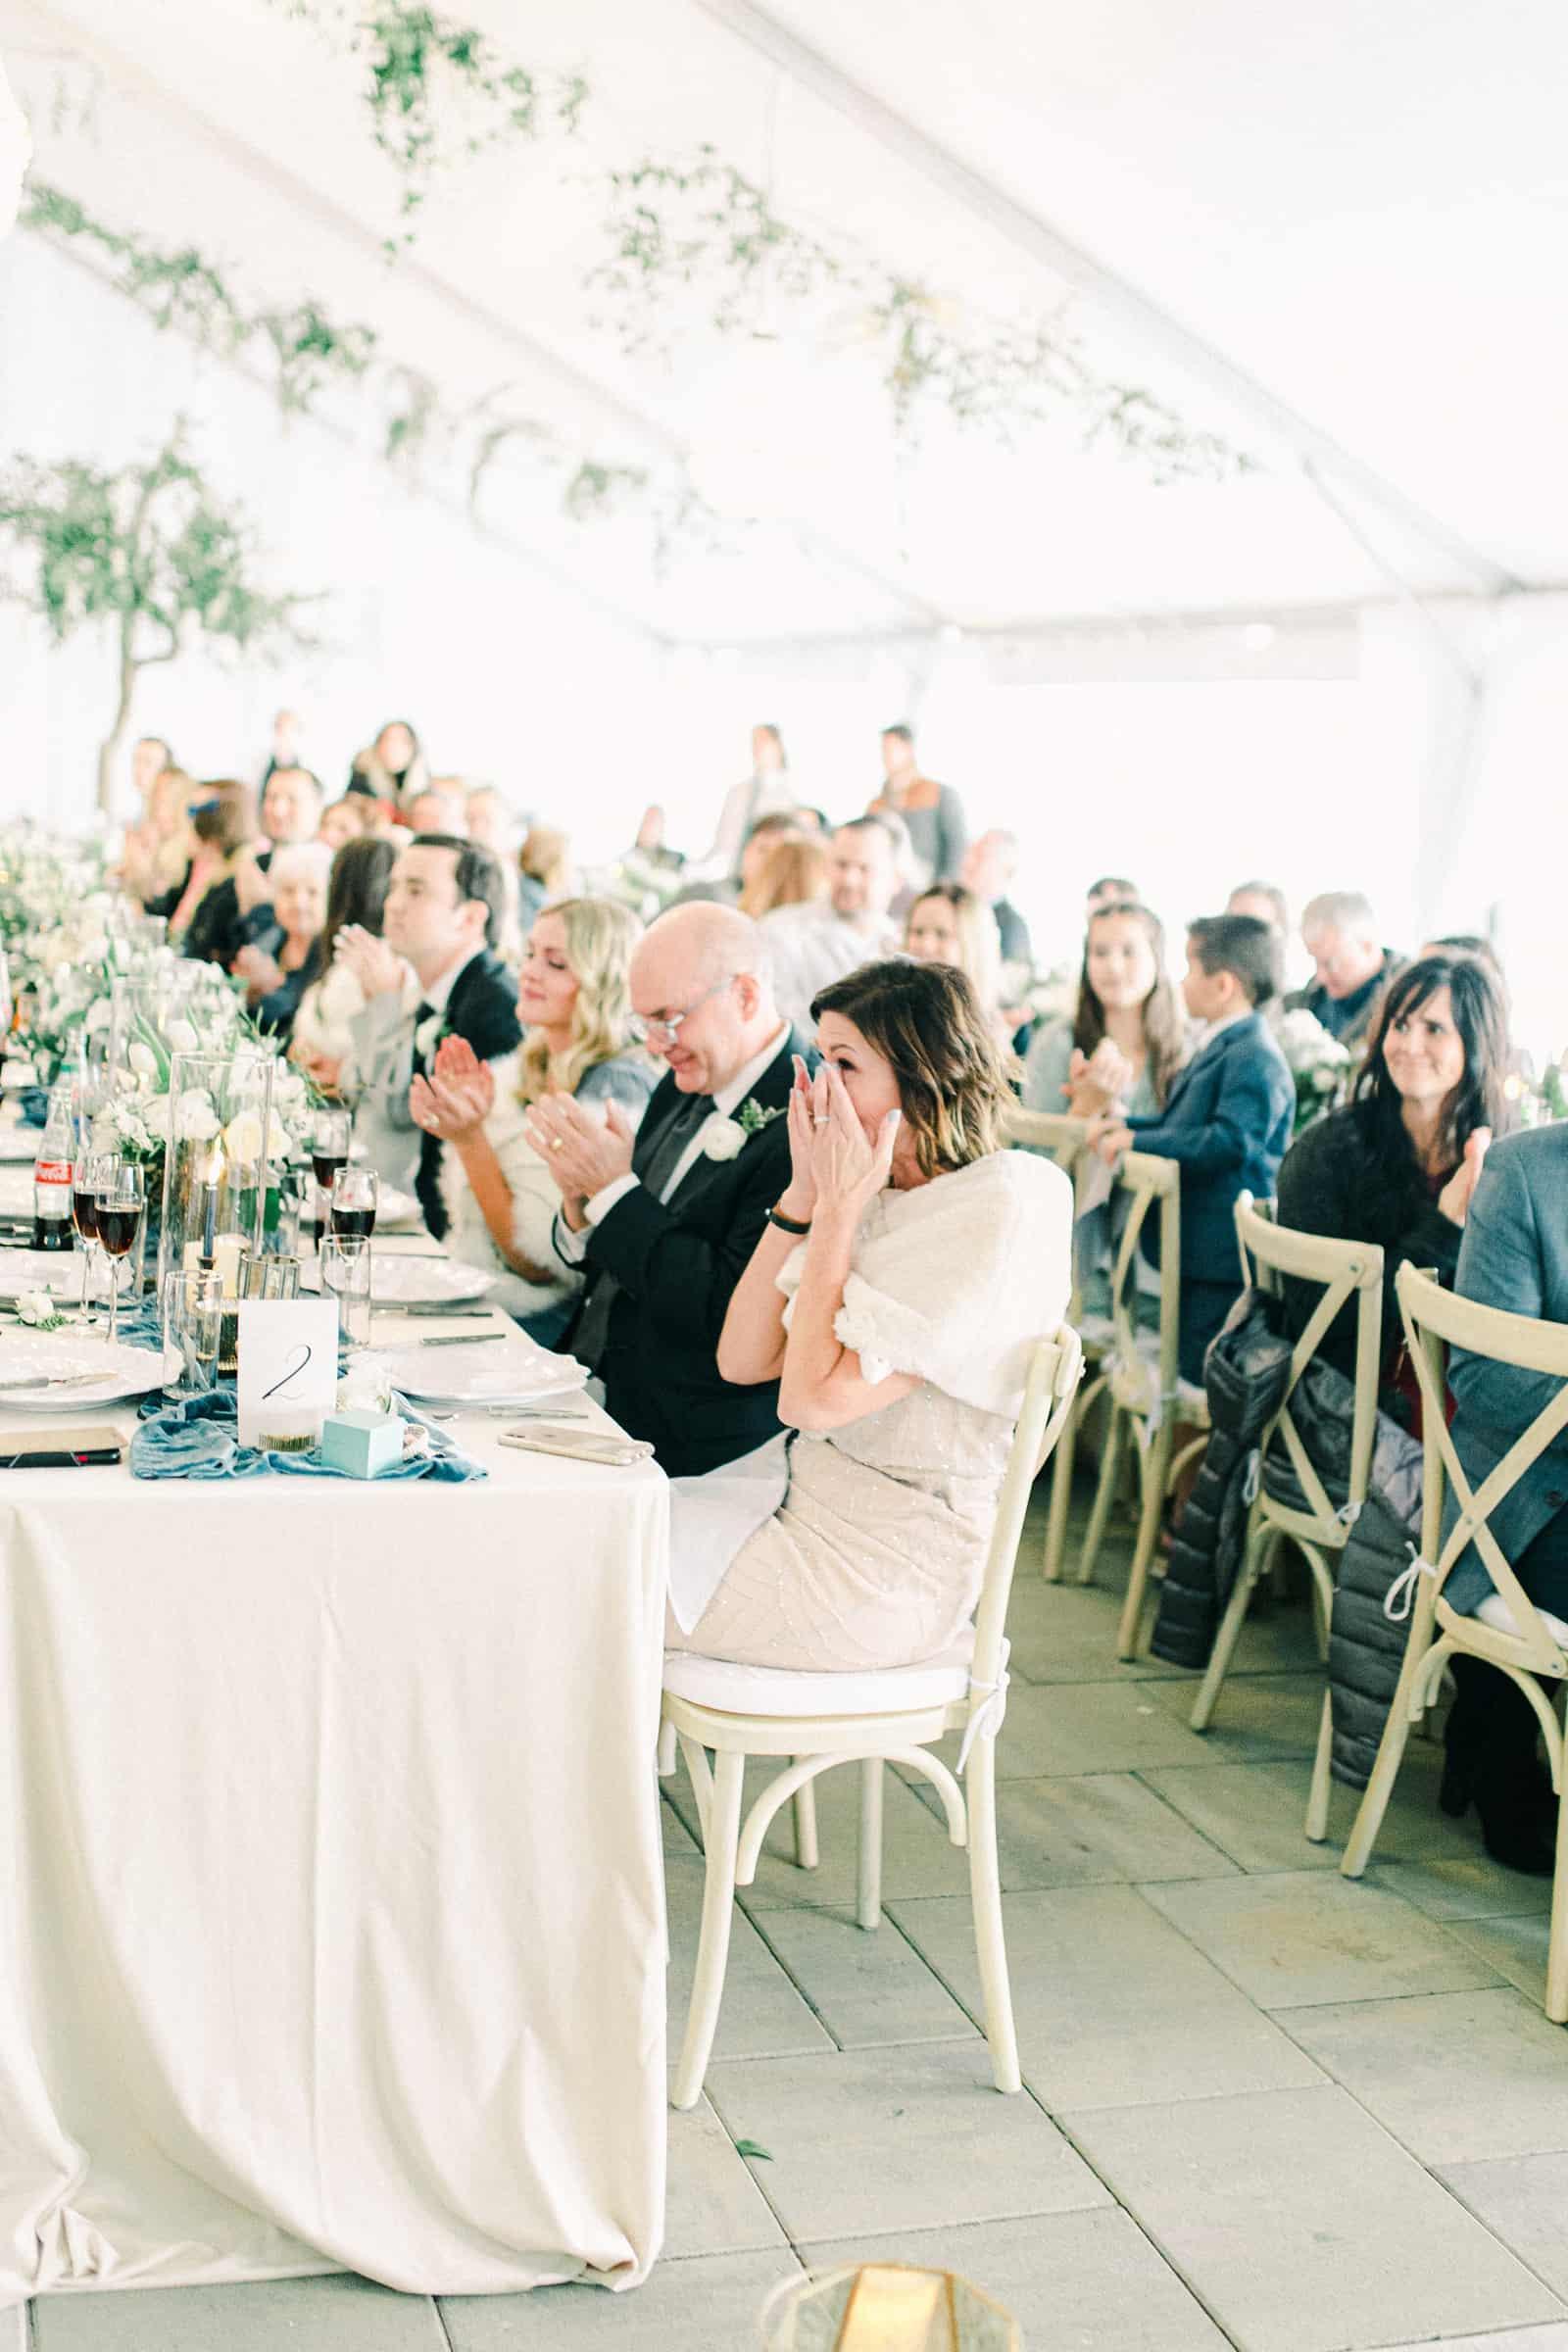 Winter wedding inside white tent reception